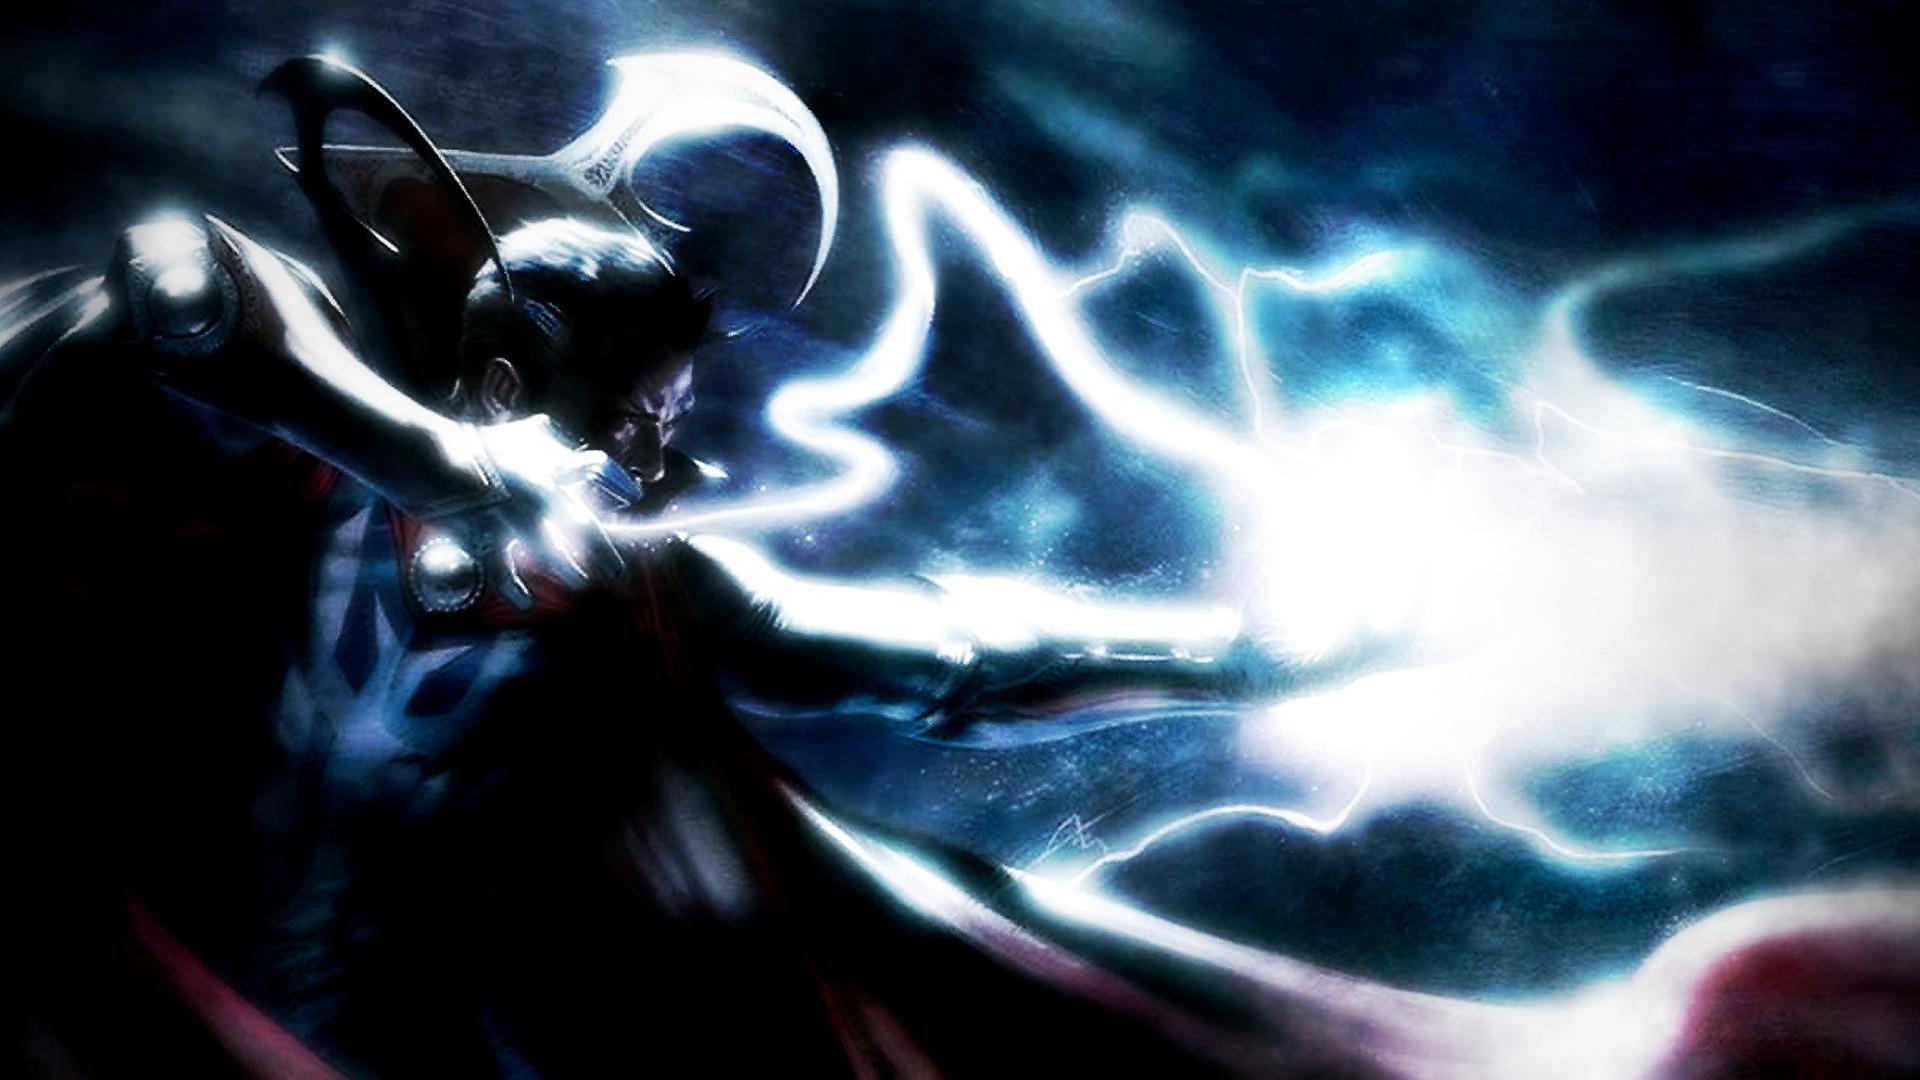 Doctor Strange Marvel Movie Wallpapers Widescreen Cinema: Doctor Strange By ProfessorAdagio On DeviantArt